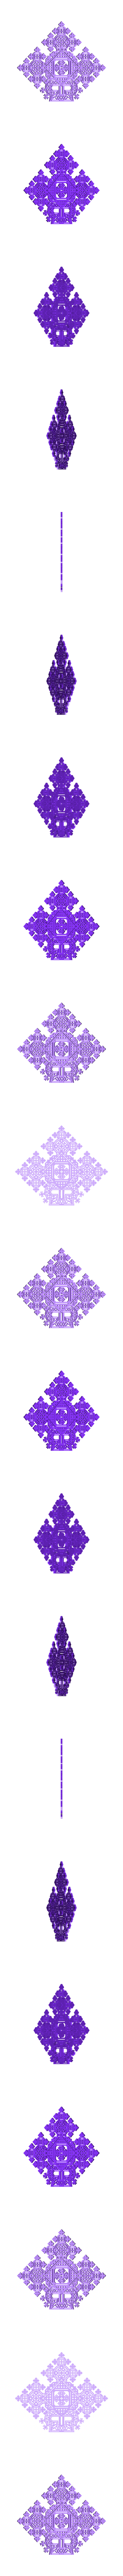 Etiope.stl Download free STL file Ethiopian cross • 3D print object, italymaker